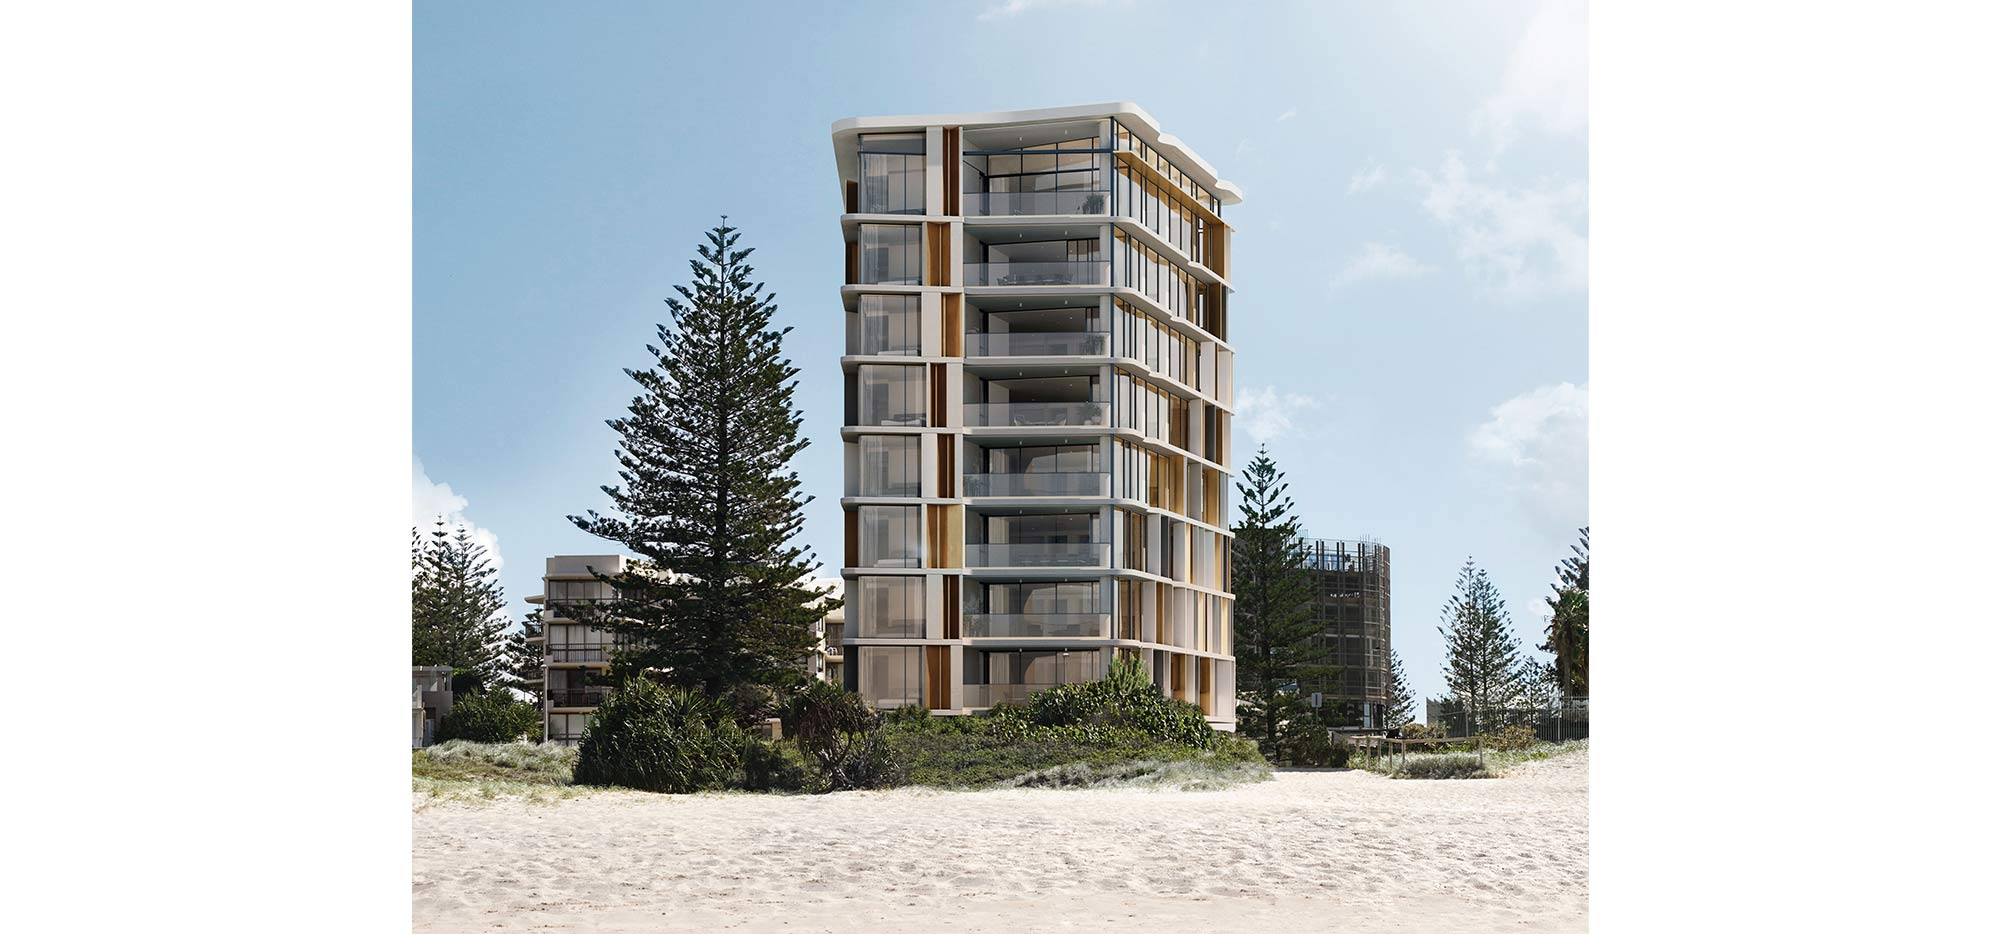 Solace-Broadbeach-Building-New.jpg